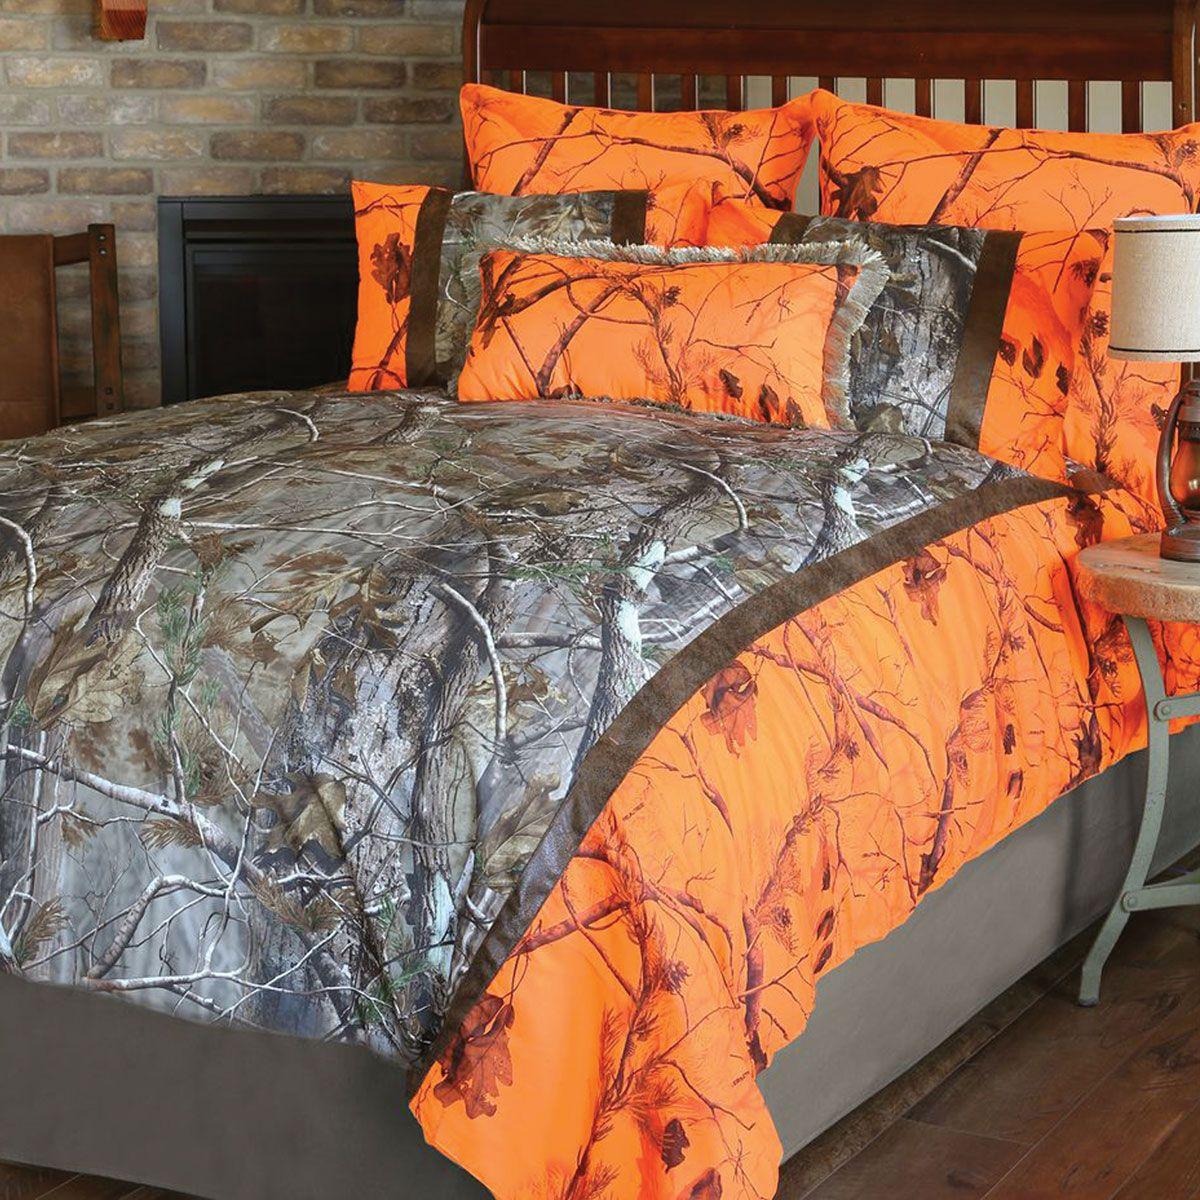 Realtree Ap And Orange Blaze Ap Camo Bed Set Queen Bed Linens